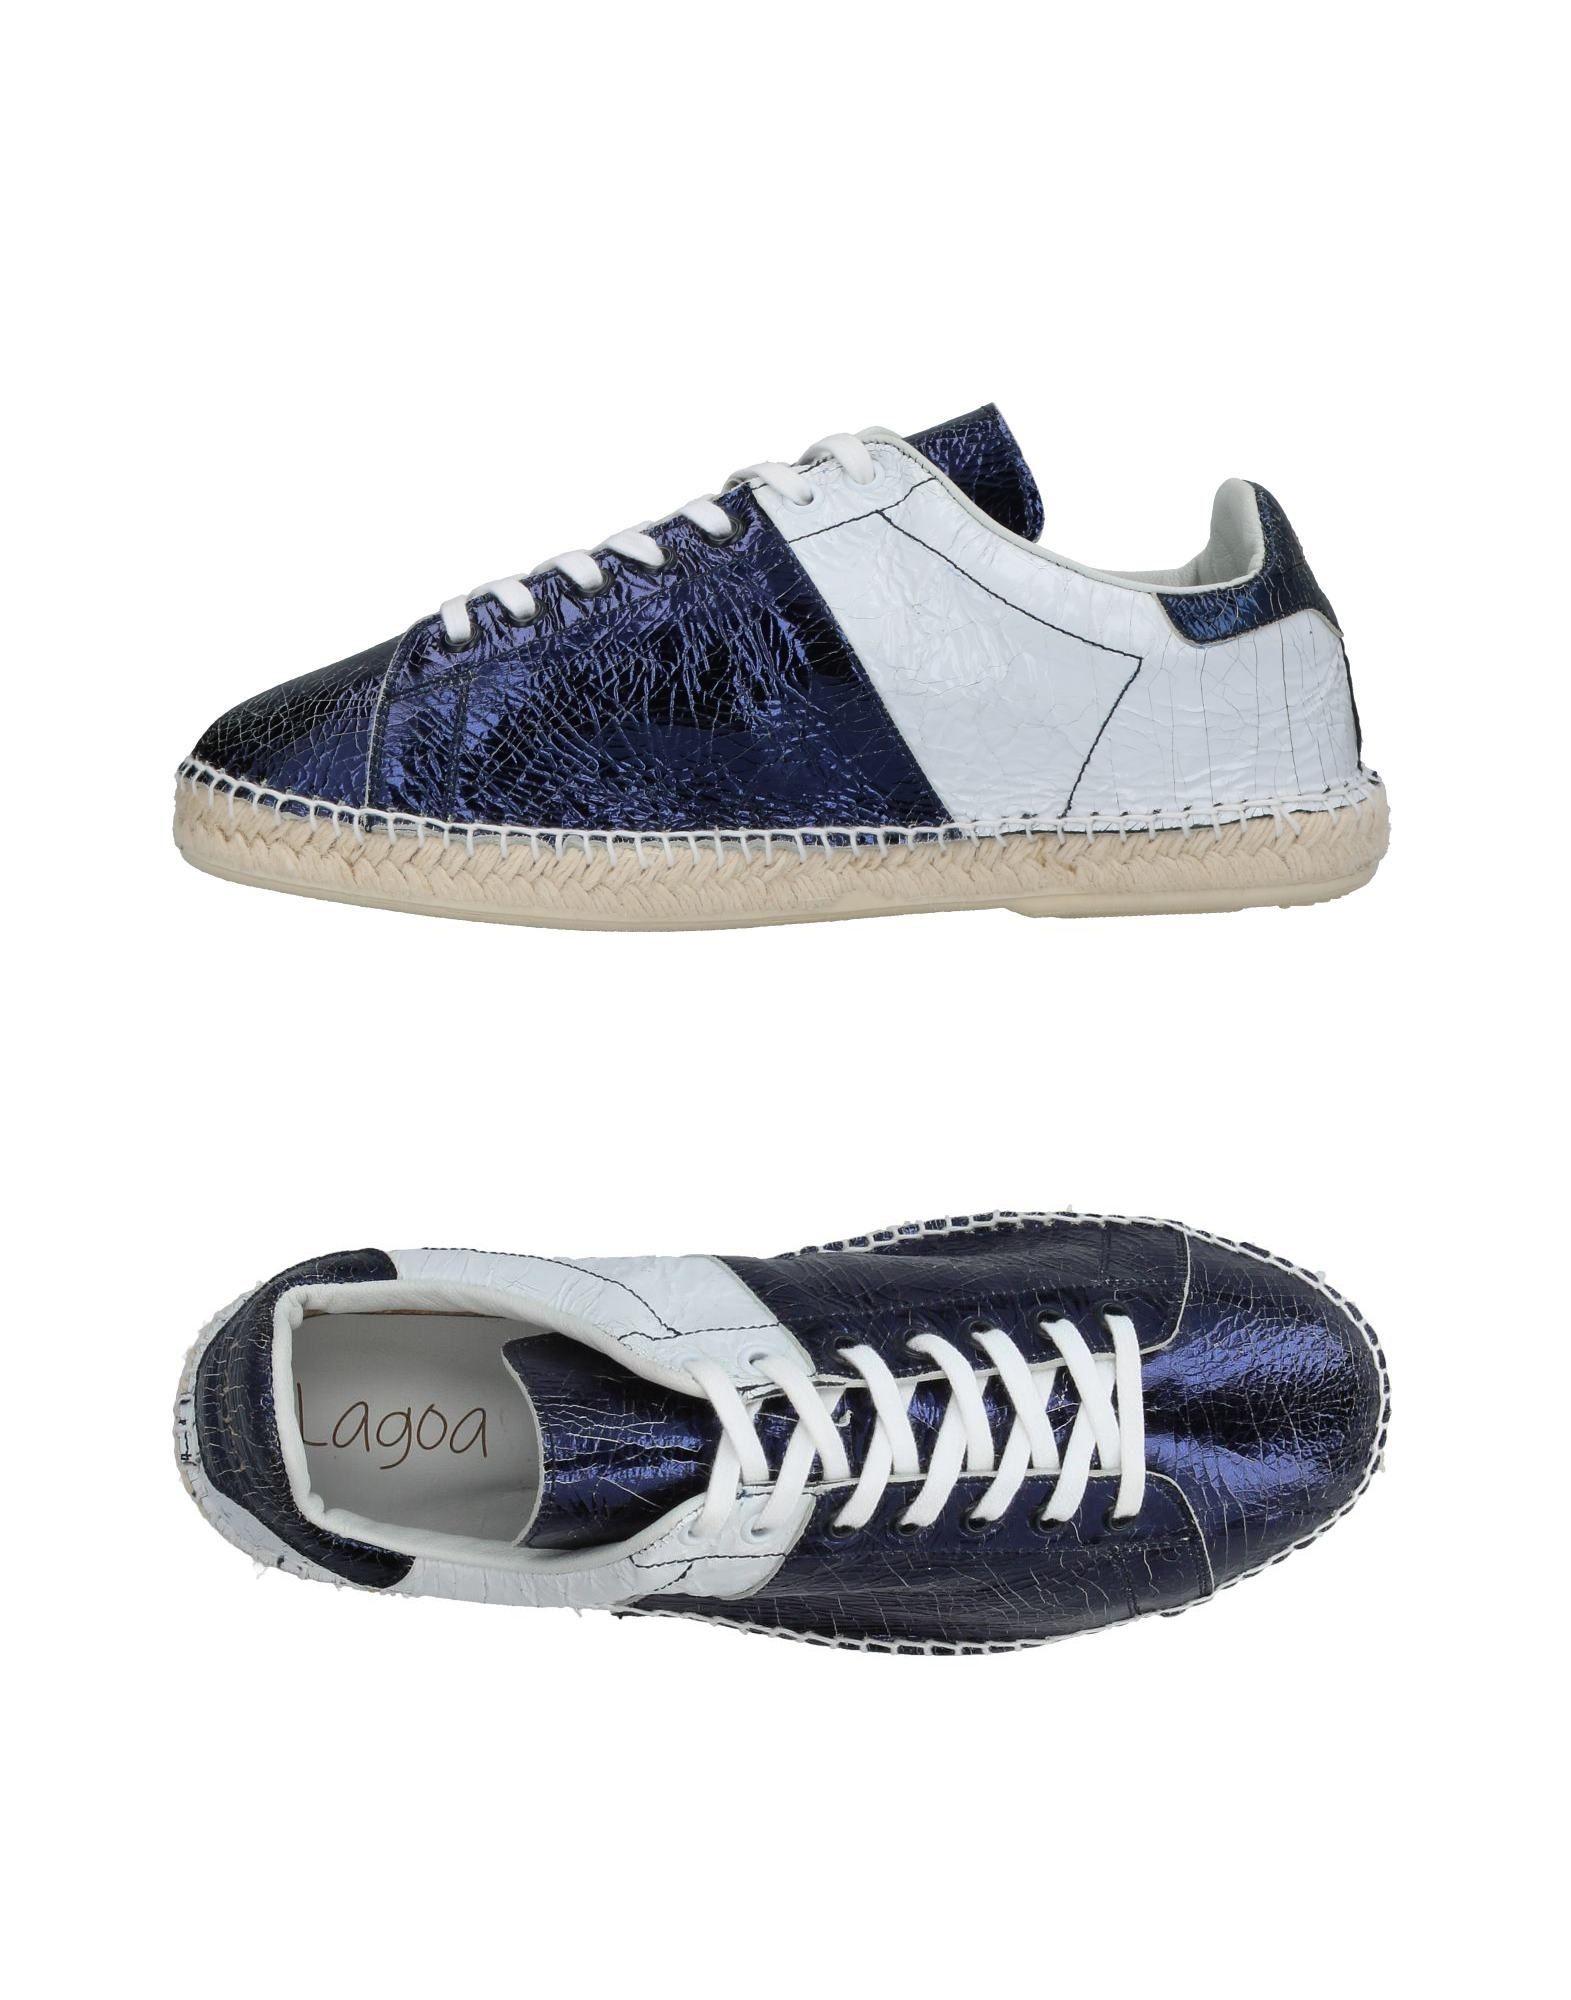 FOOTWEAR - Low-tops & sneakers Lagoa Comfortable Grey Outlet Store Online D9WTxFFj